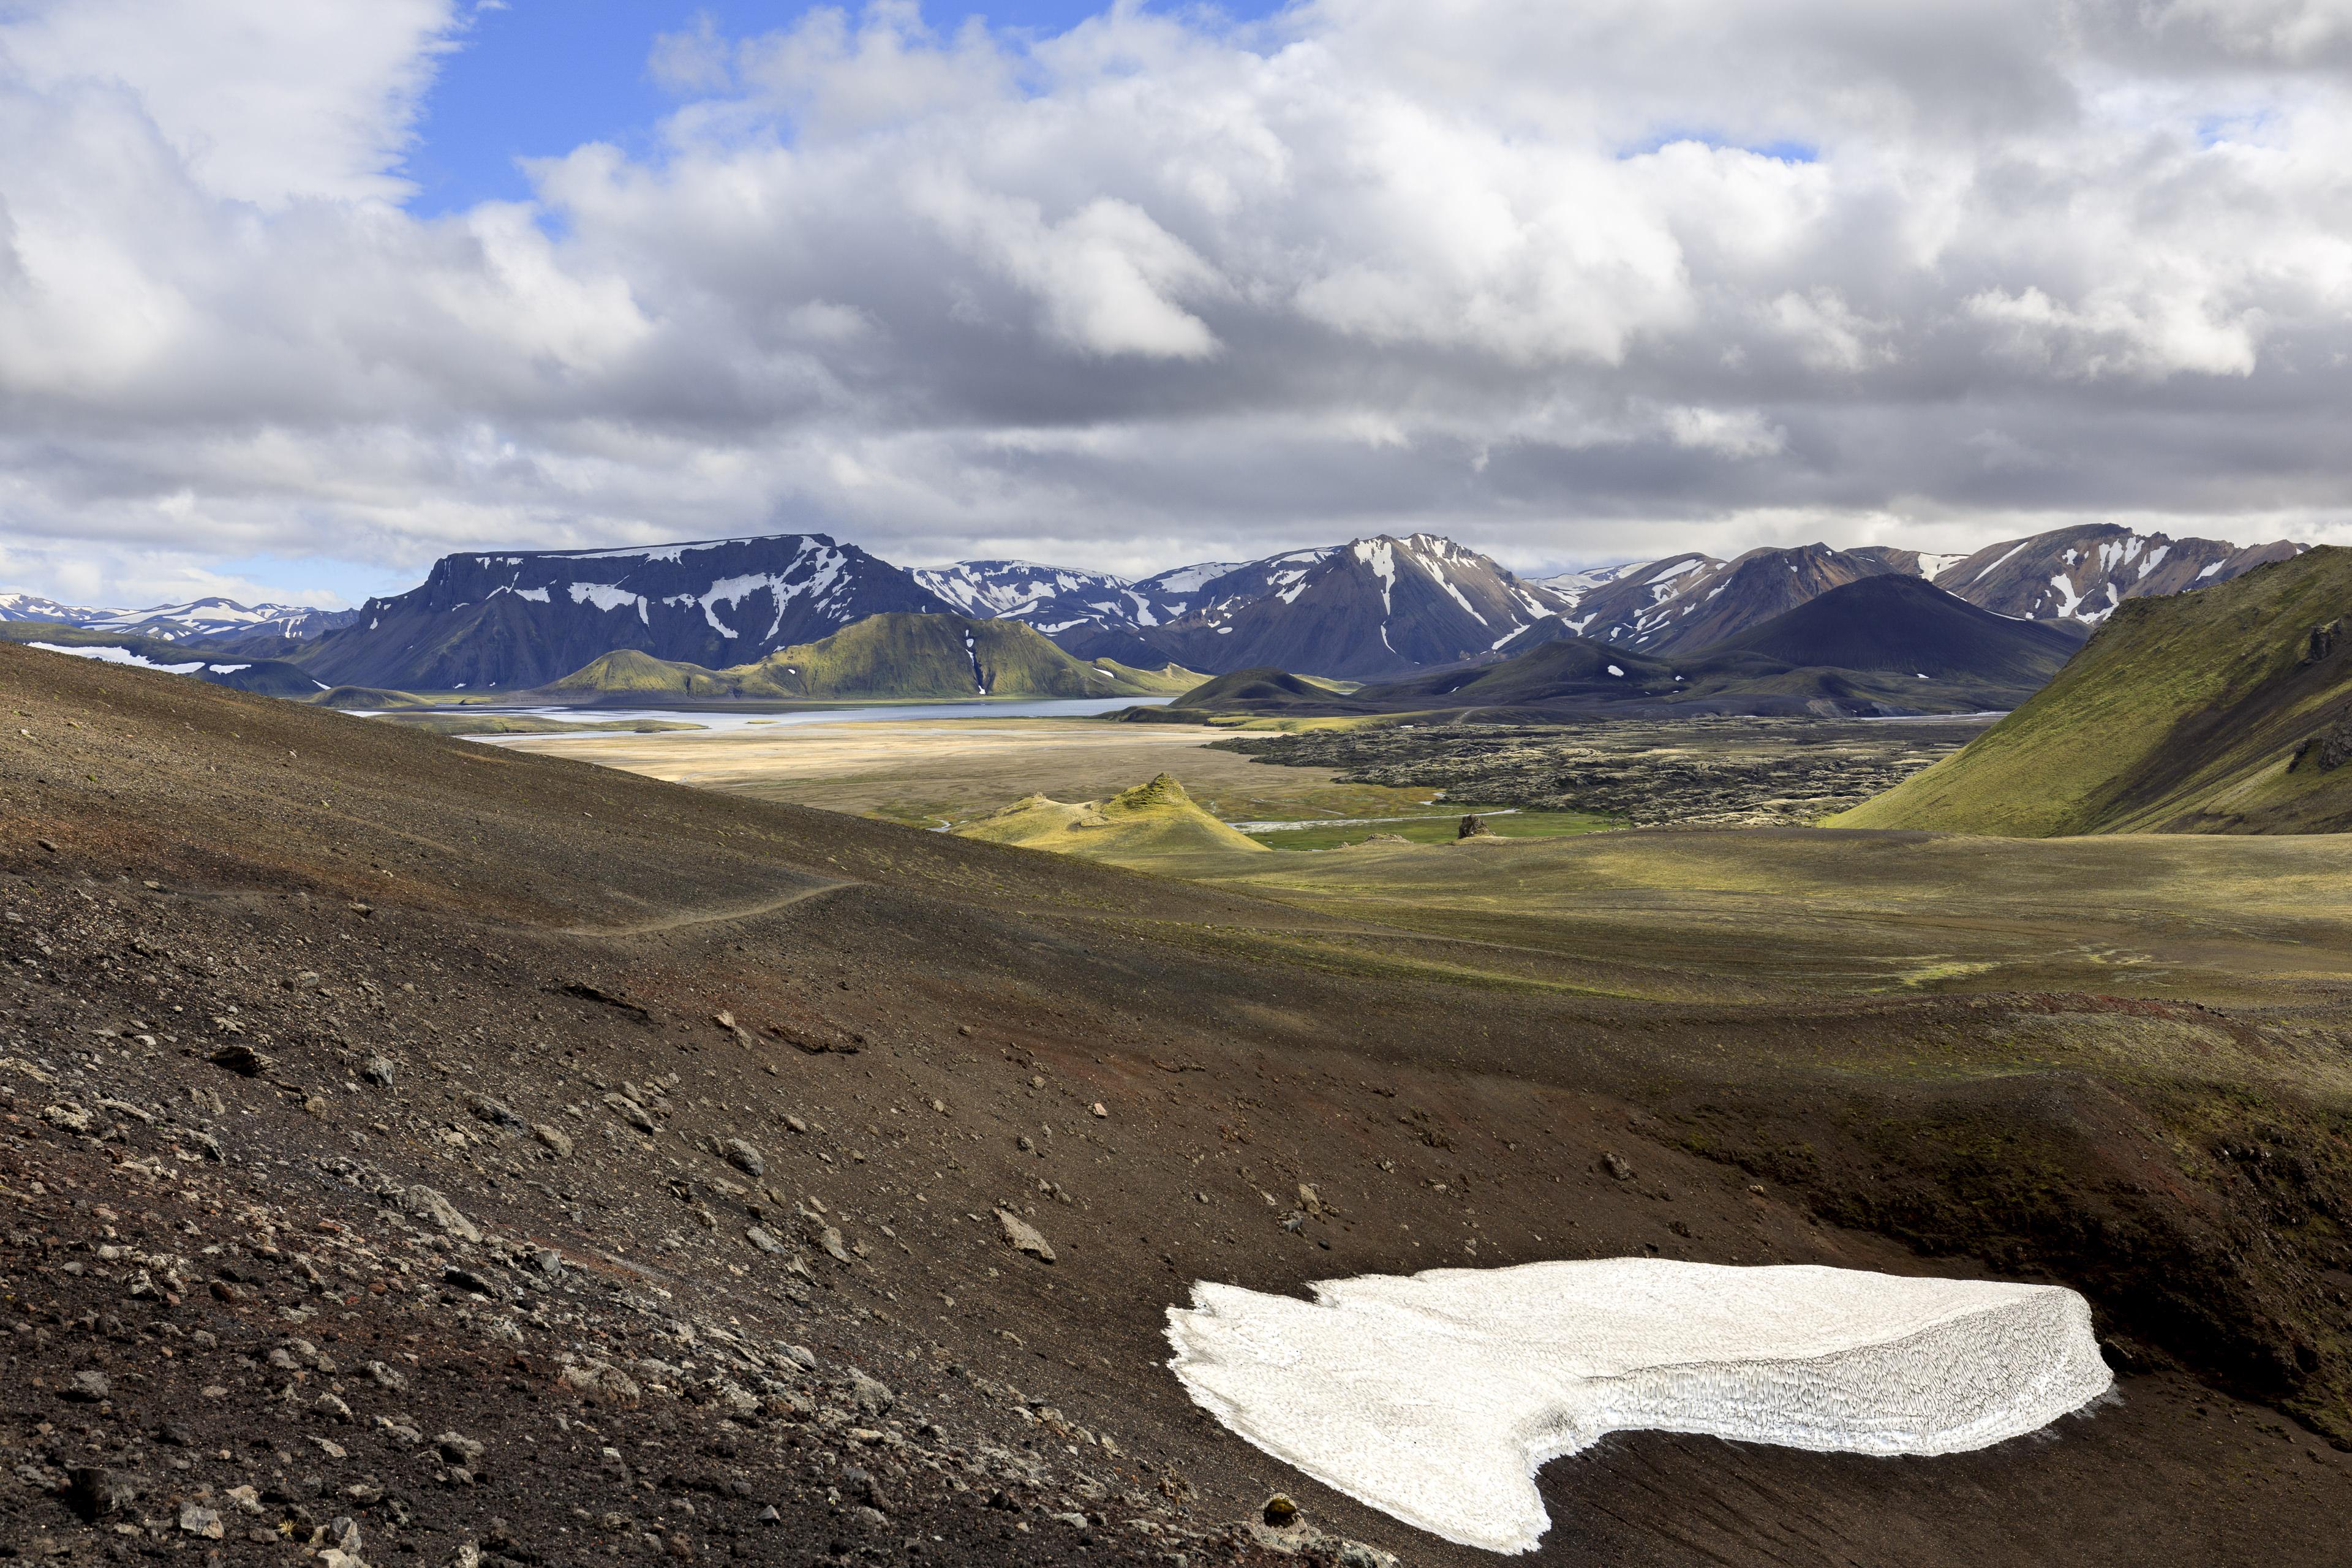 Am Rand des Norðurnámshraun zurück in Richtung Landmannalaugar,©Markus Proske—Canon EOS 5D Mark IV, EF16-35mm f/4L IS USM, 35mm, 1/320s, Blende 8, ISO 200